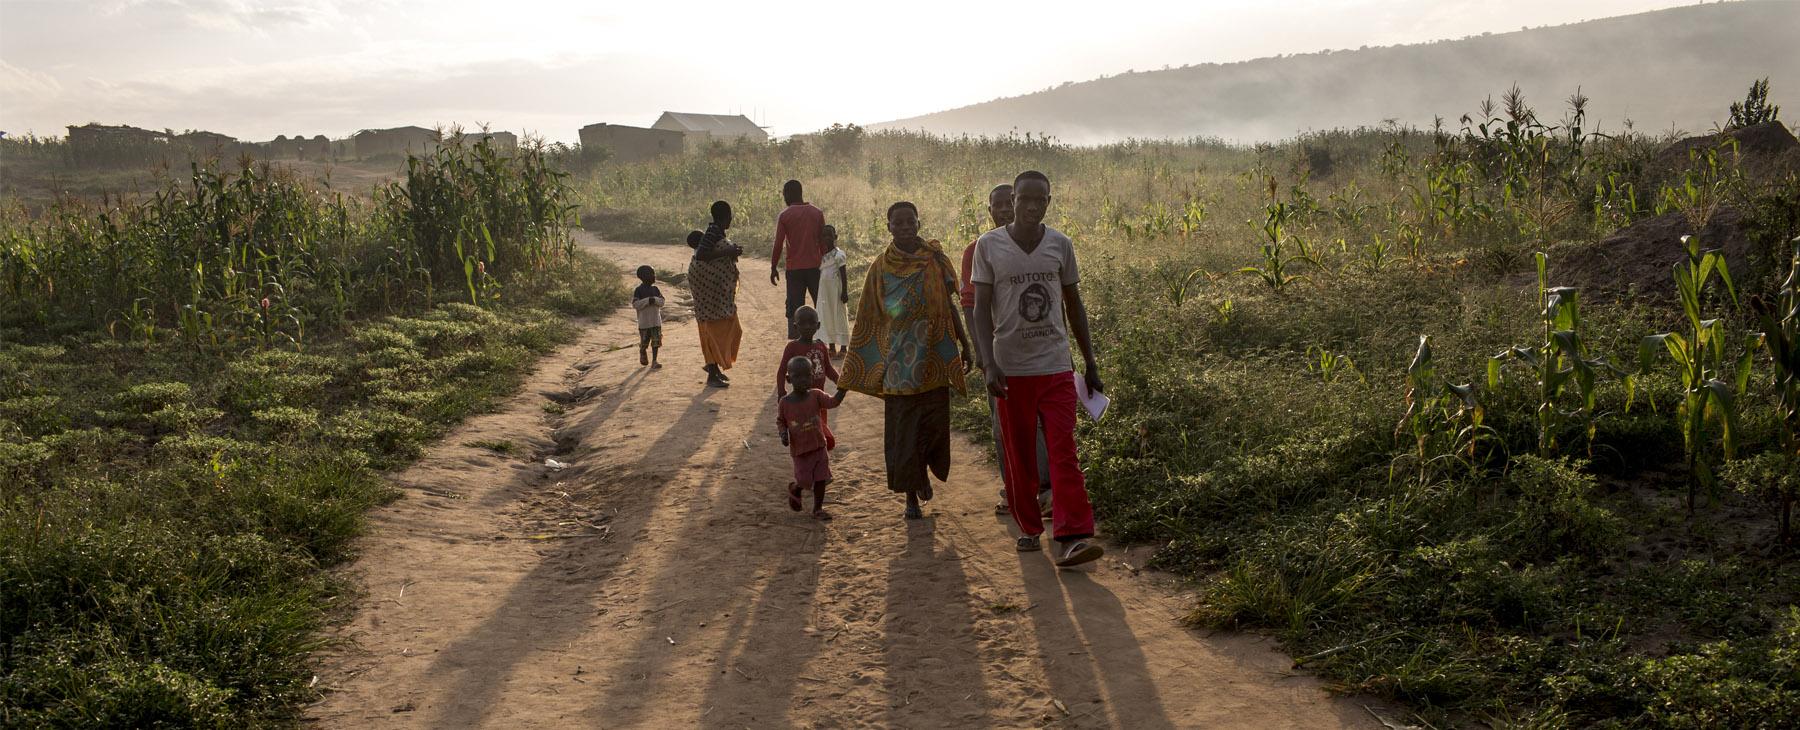 Testimonies: when international bodies finally deliver justice